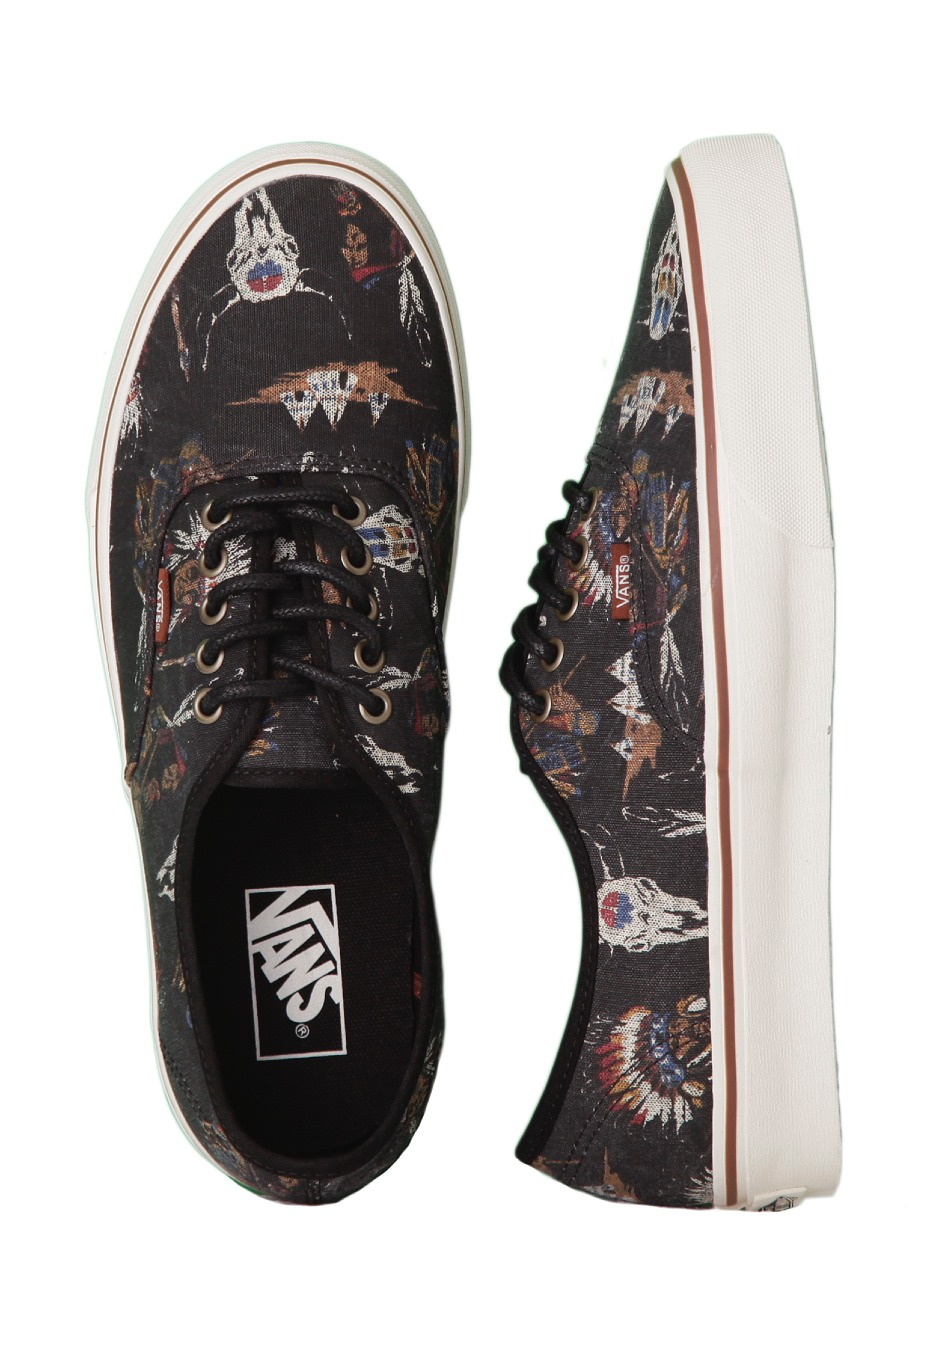 Vans Authentic Tribal Leaders Shoes